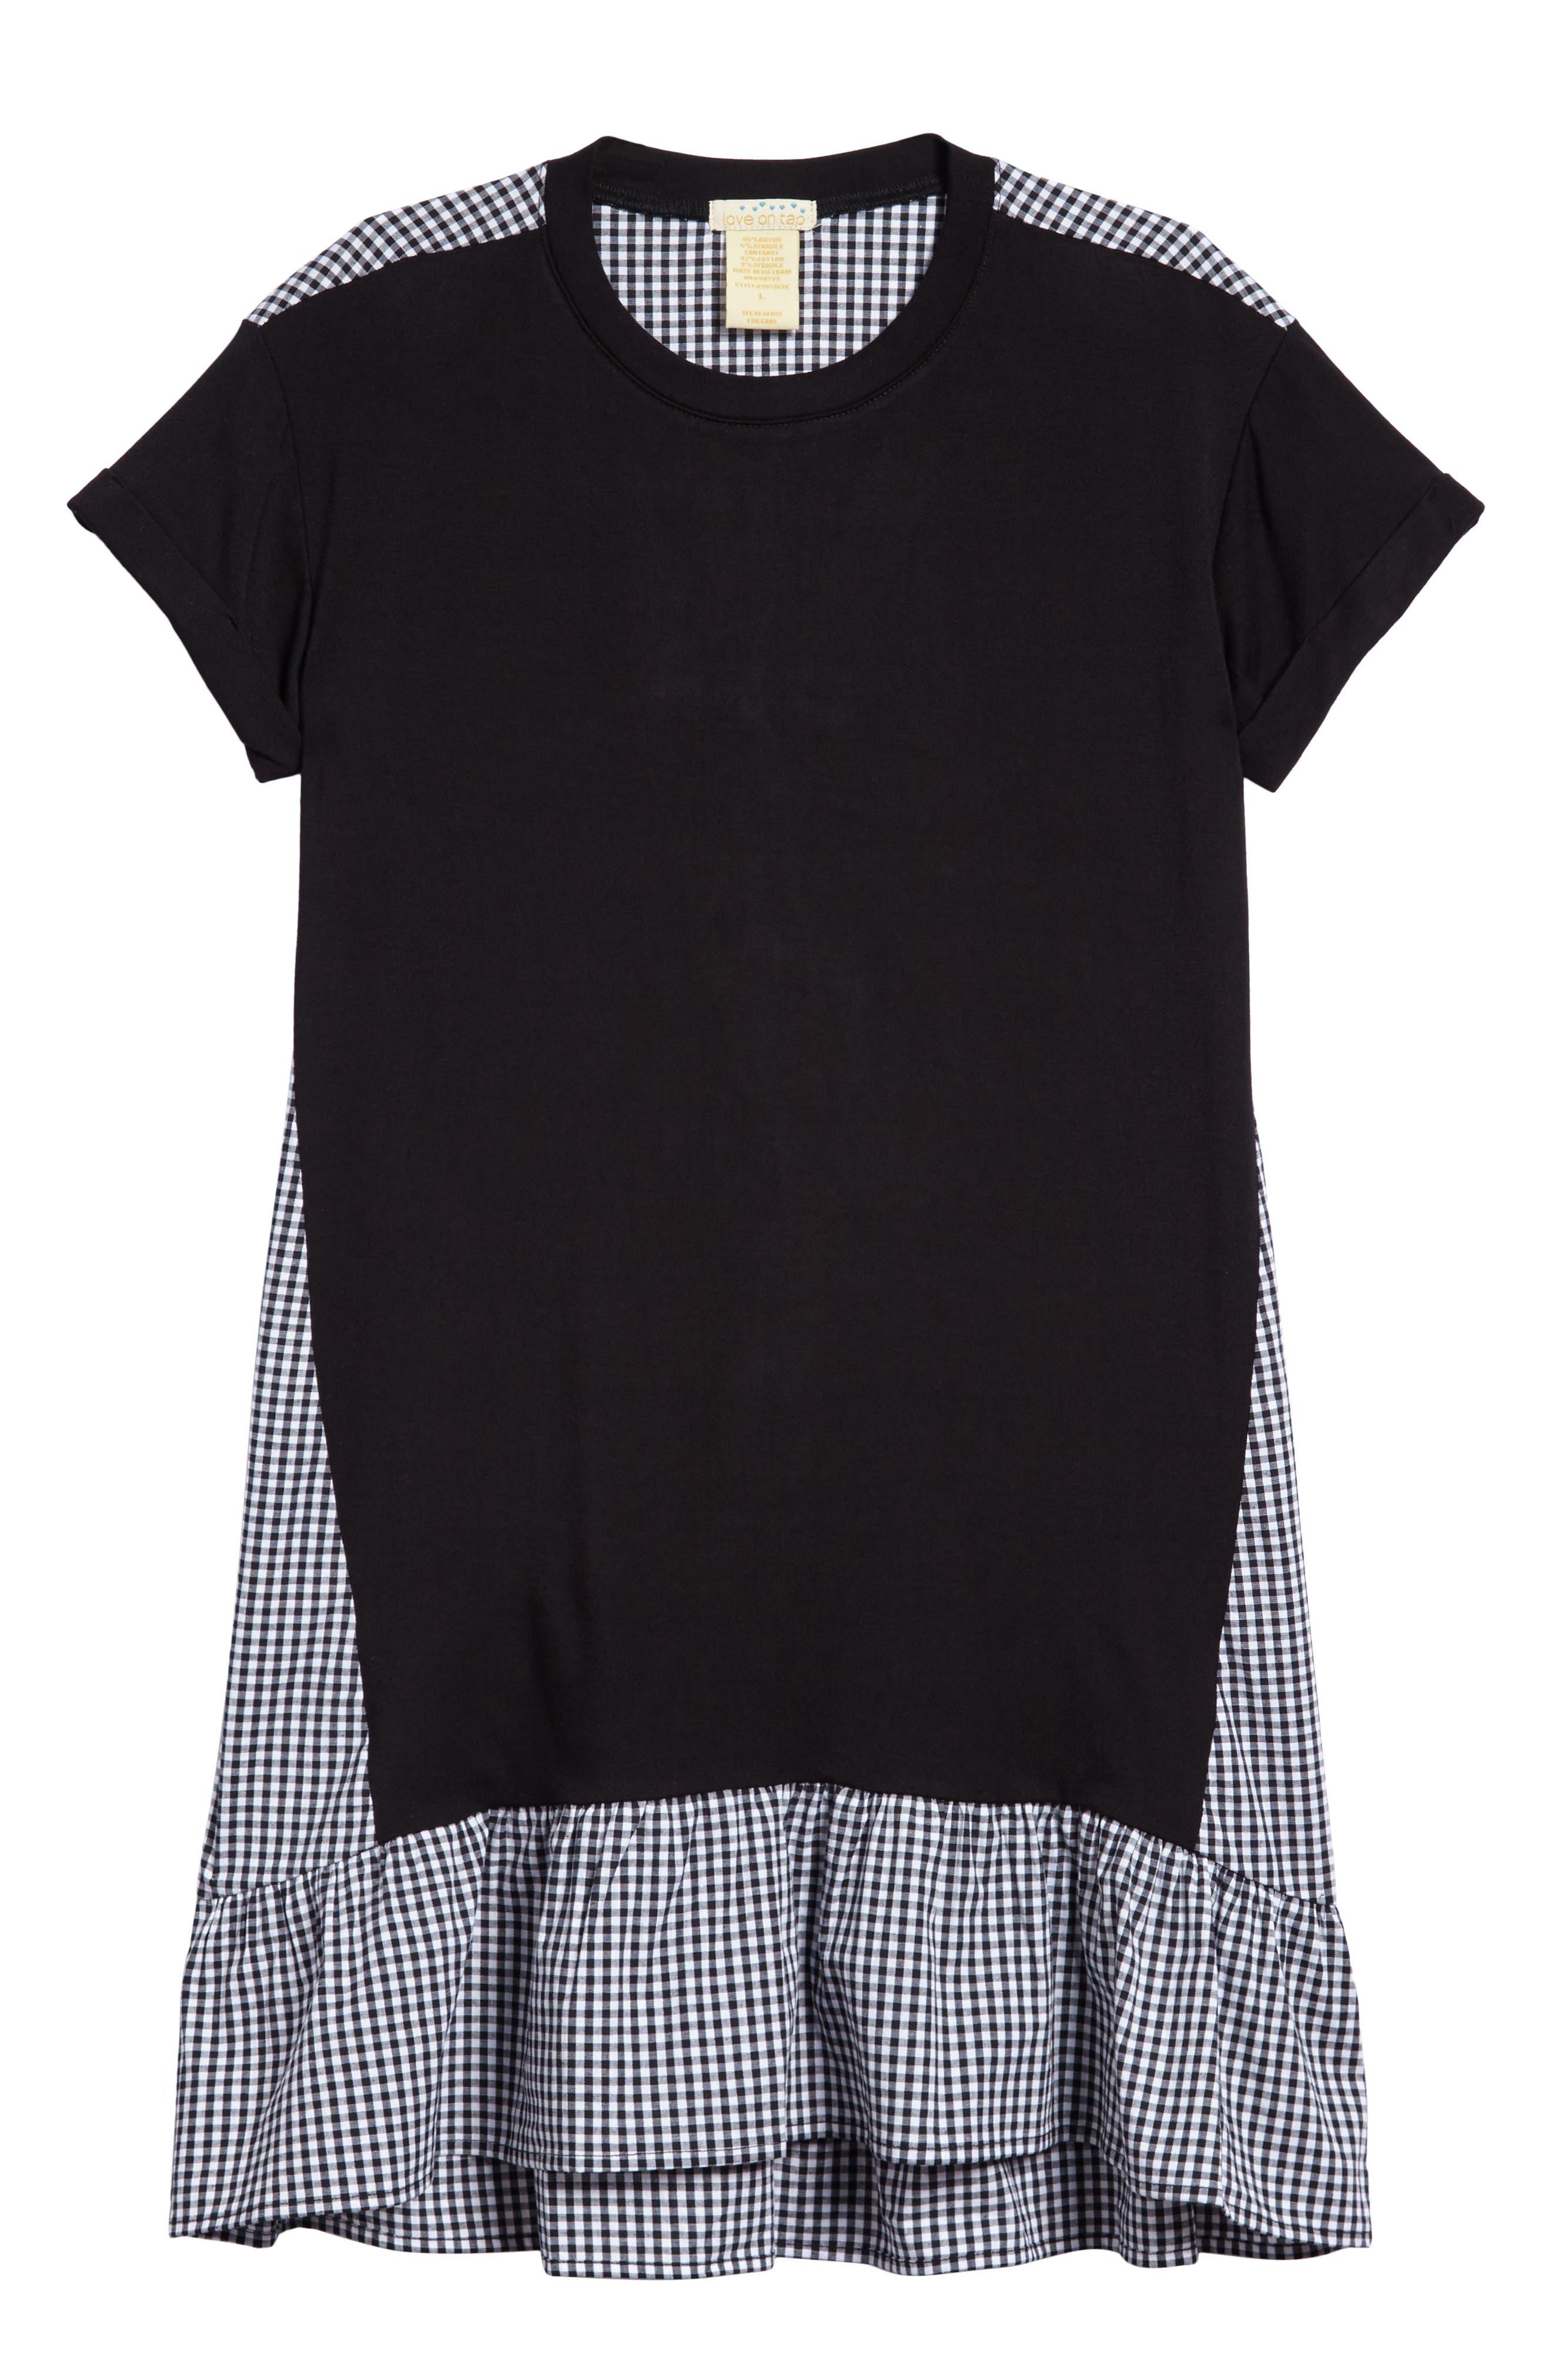 Main Image - Love on Tap T-Shirt Dress (Big Girls)